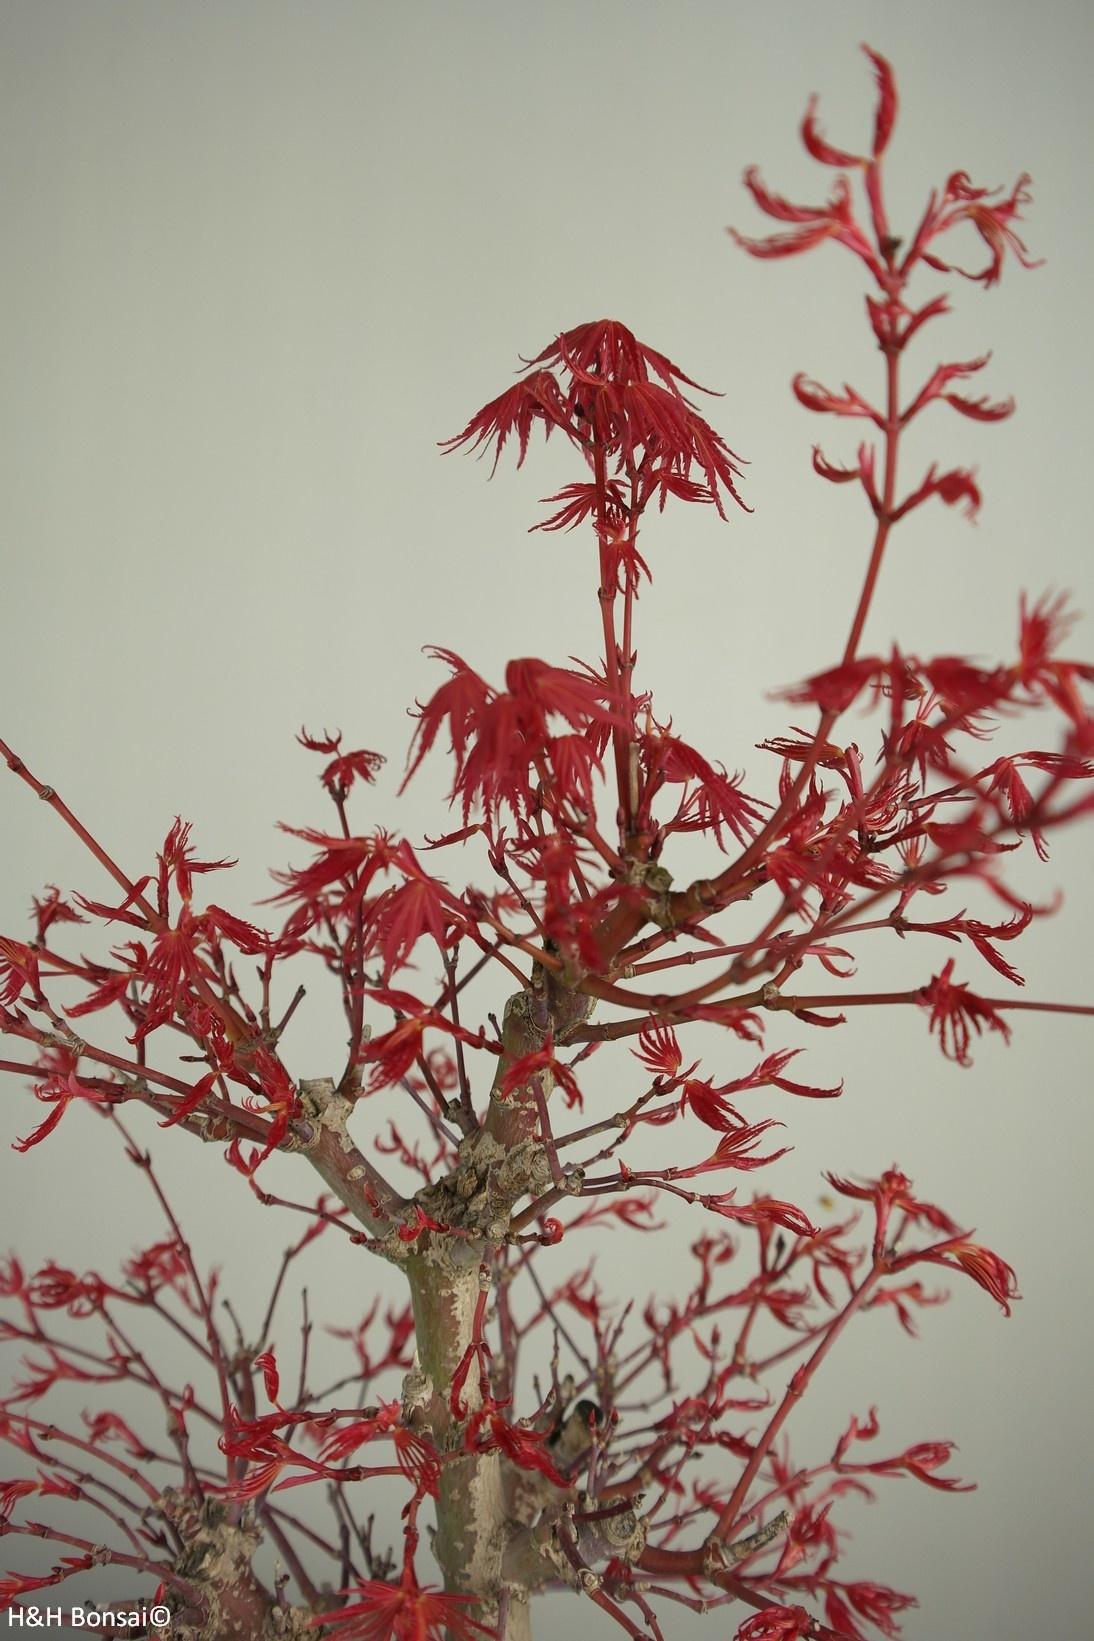 Bonsai Acer palmatum deshojo, Japanse esdoorn, nr. 7506